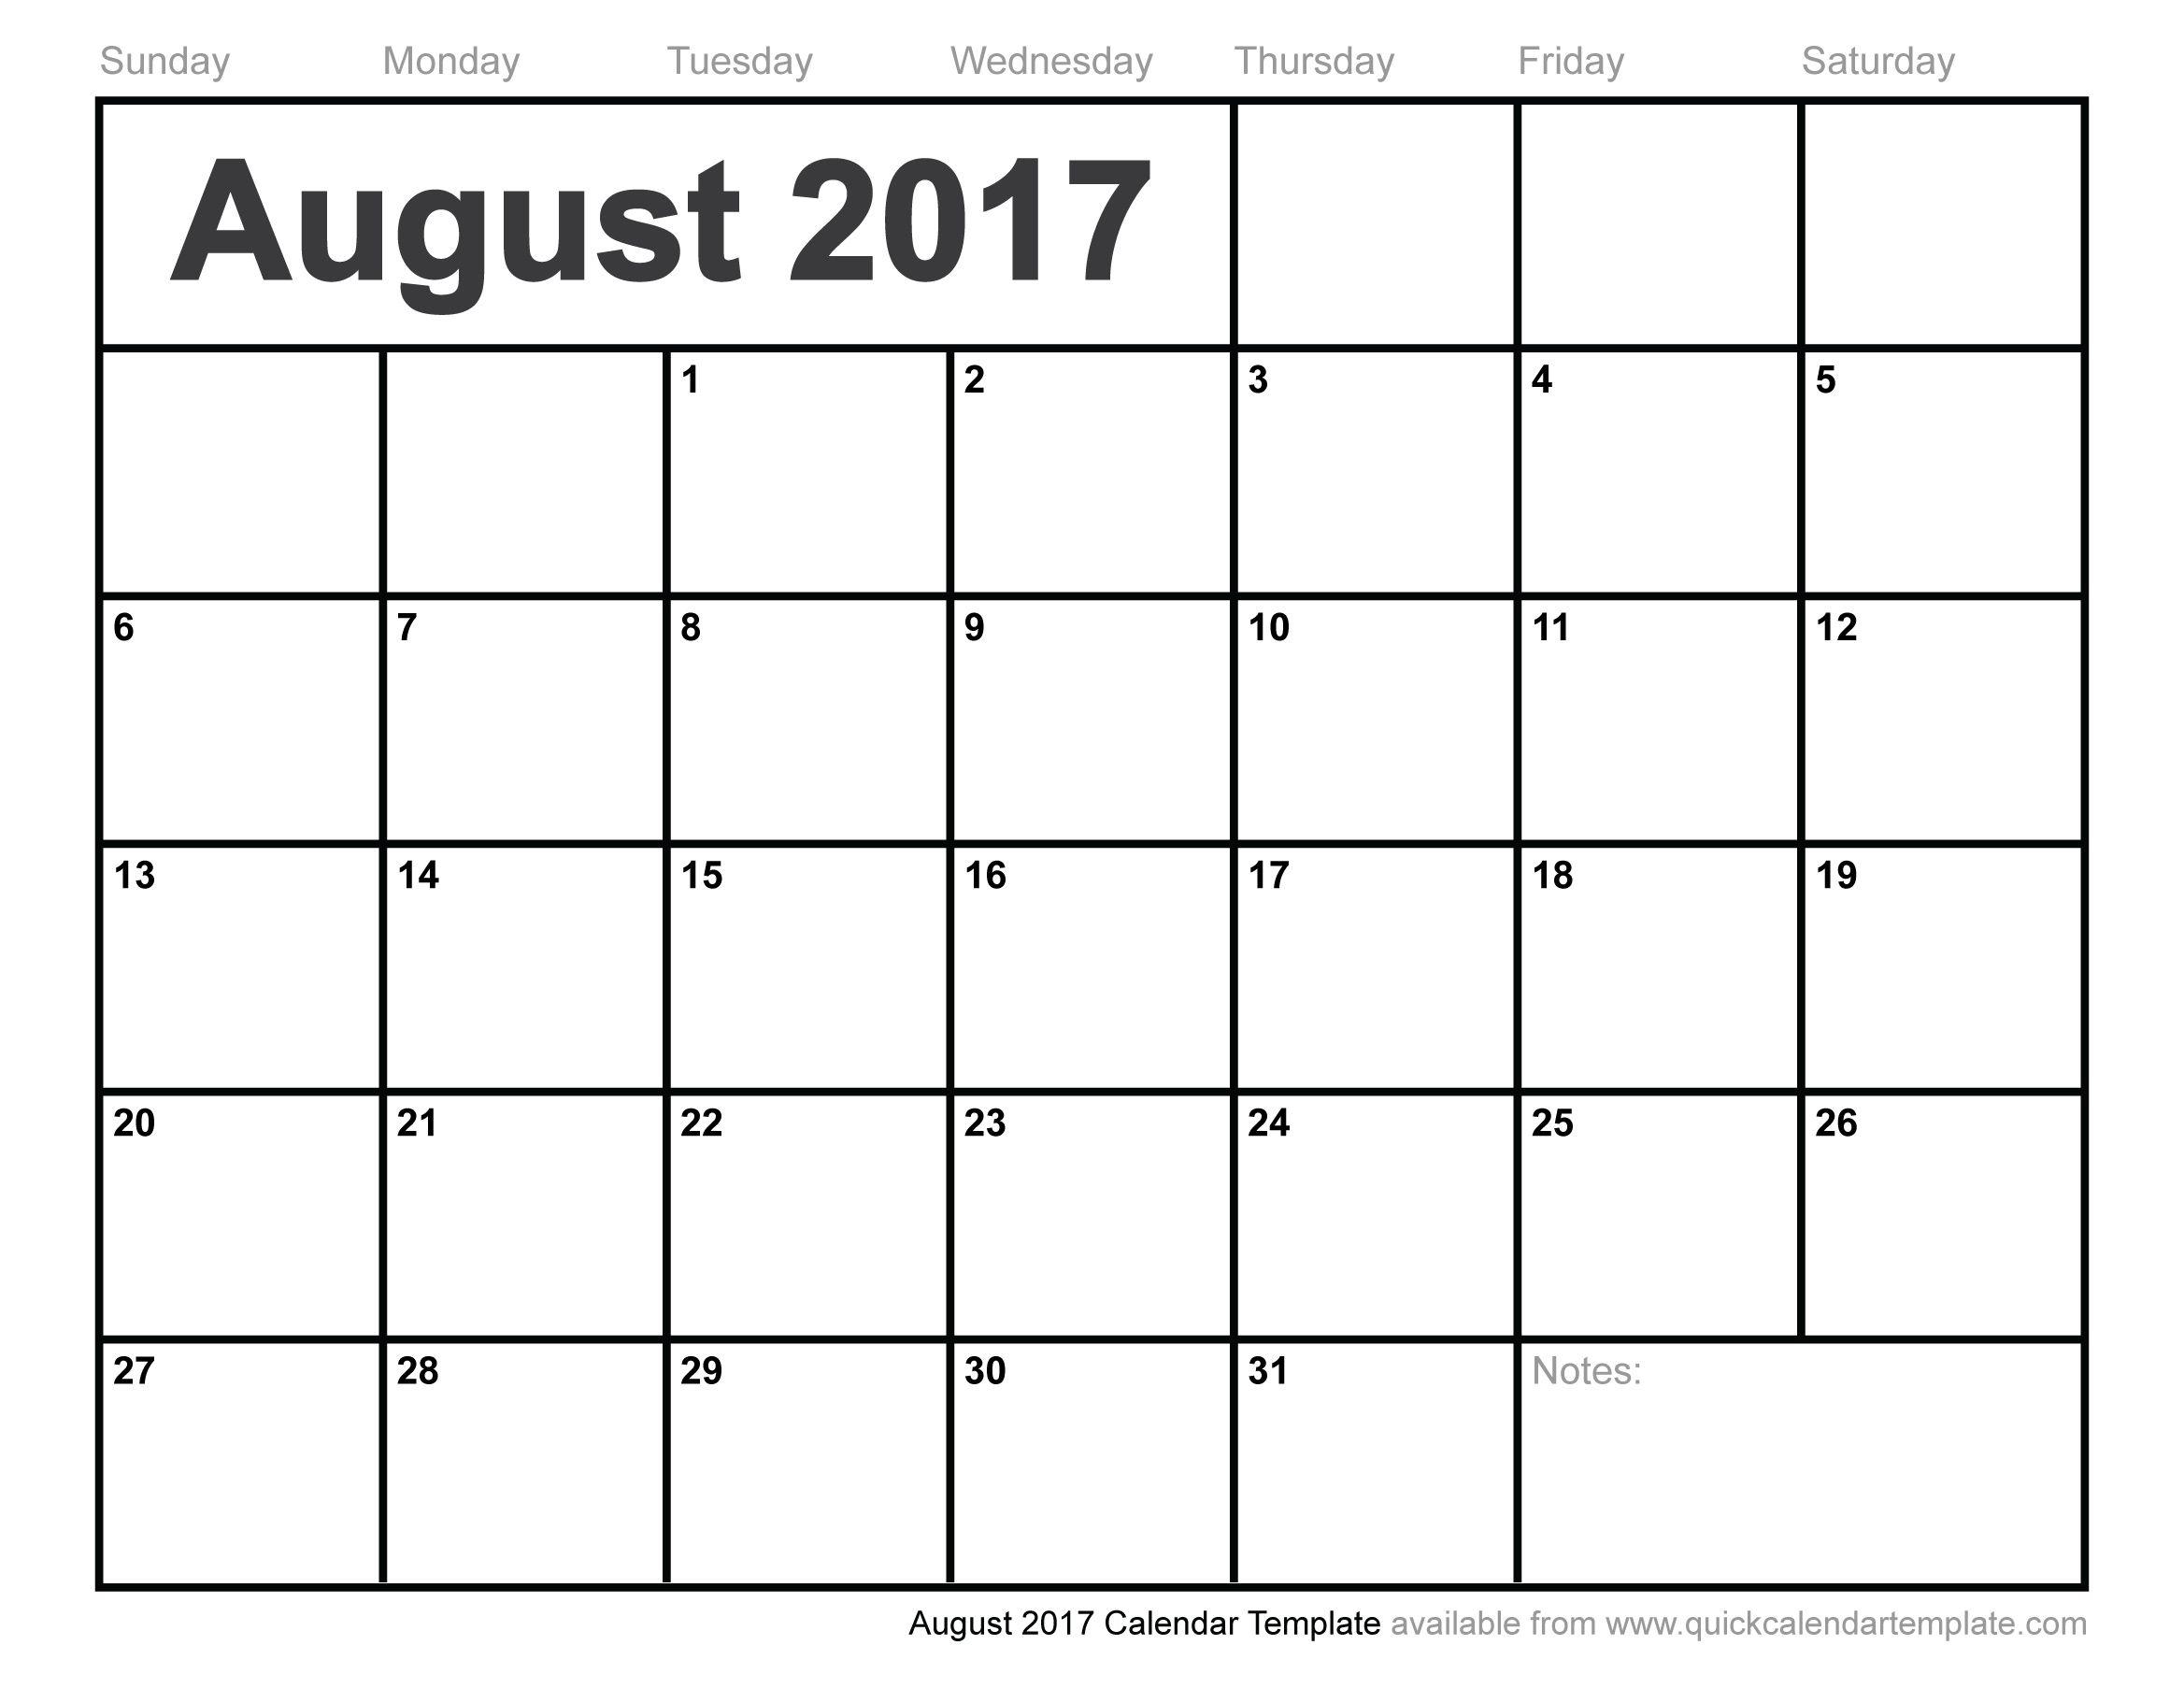 Blank August 2017 Calendar   August 2017 Calendar   June Calendar - Free Printable August 2017